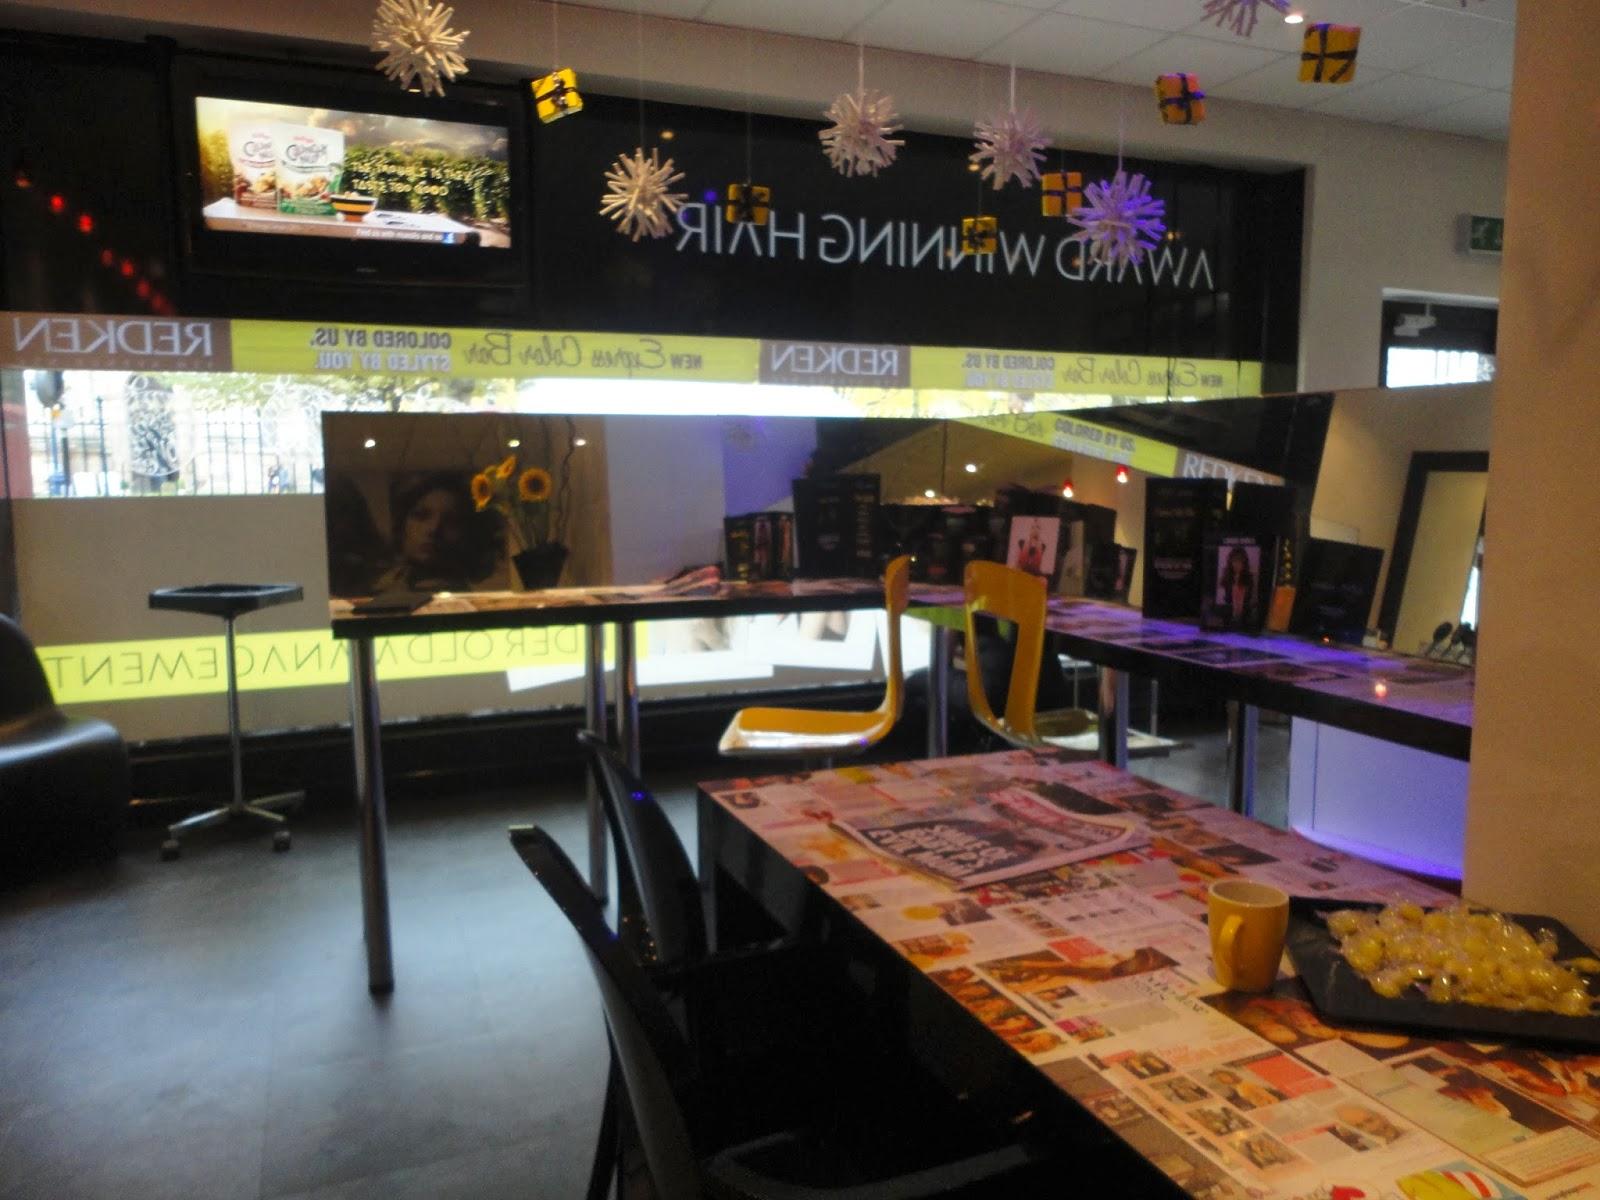 Lisa shepherd salon pretty young thing for 6 salon birmingham